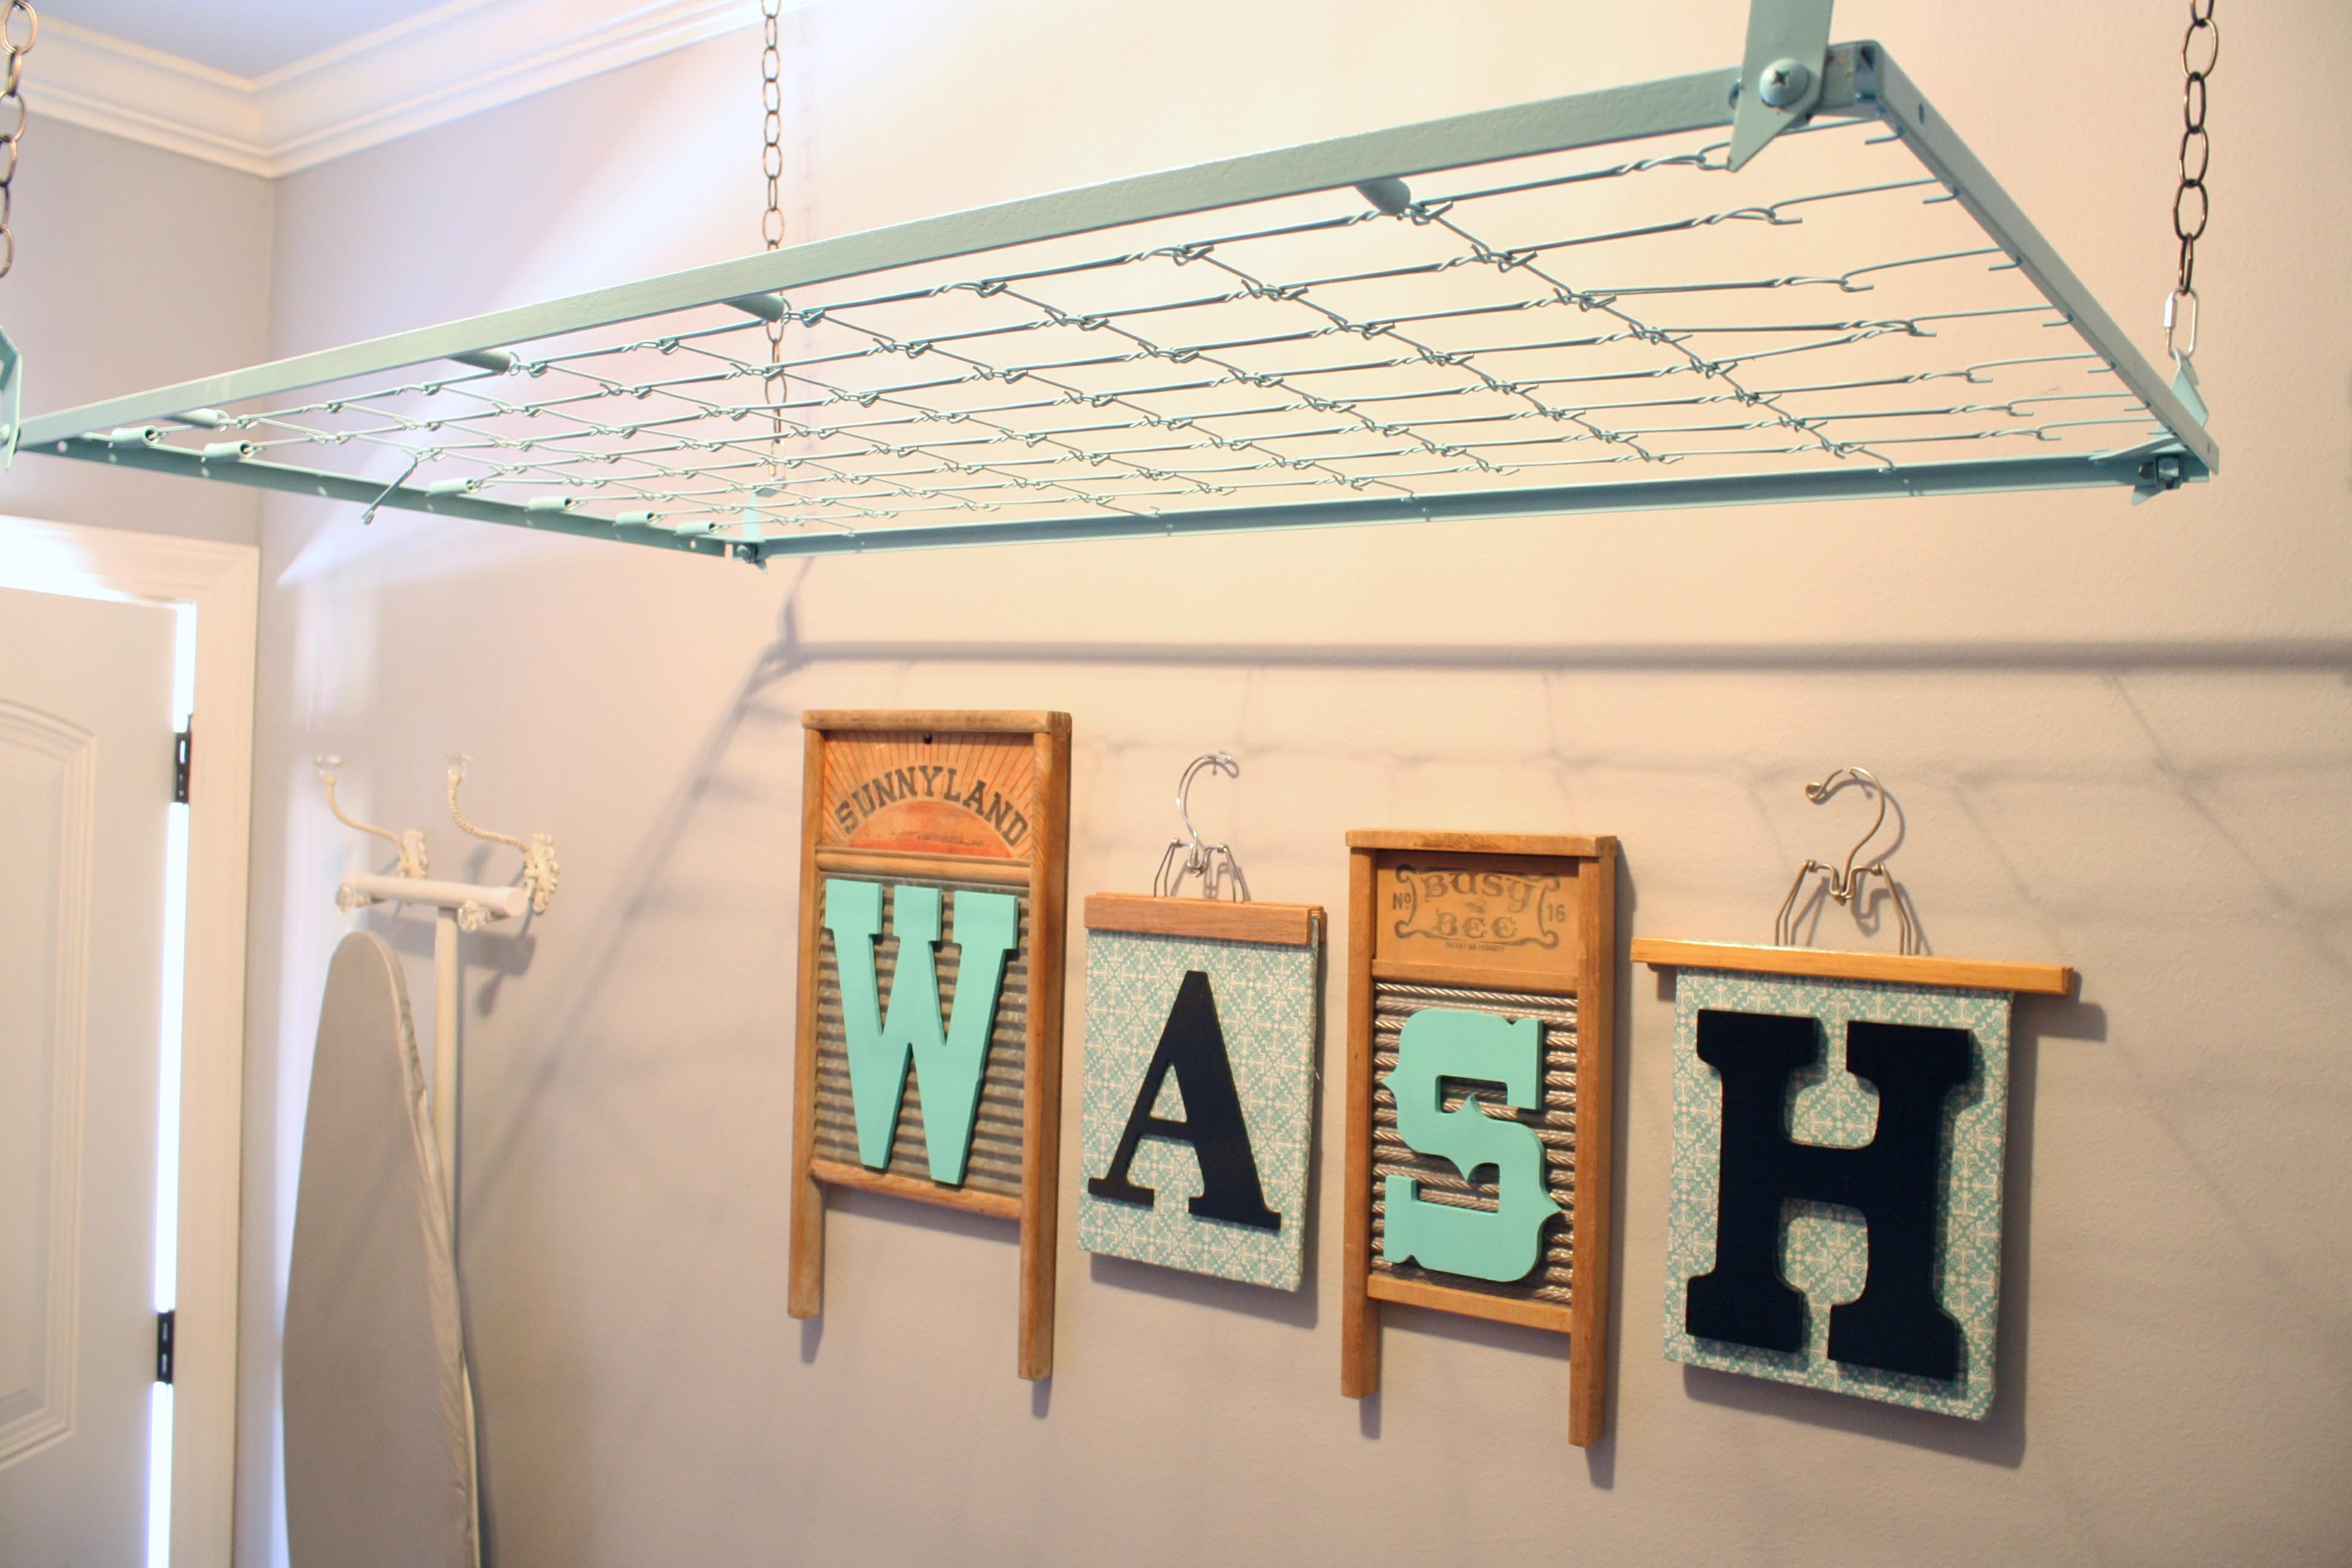 Crib Spring Drying Rack Wash Room Decor – A Diamond in the Stuff